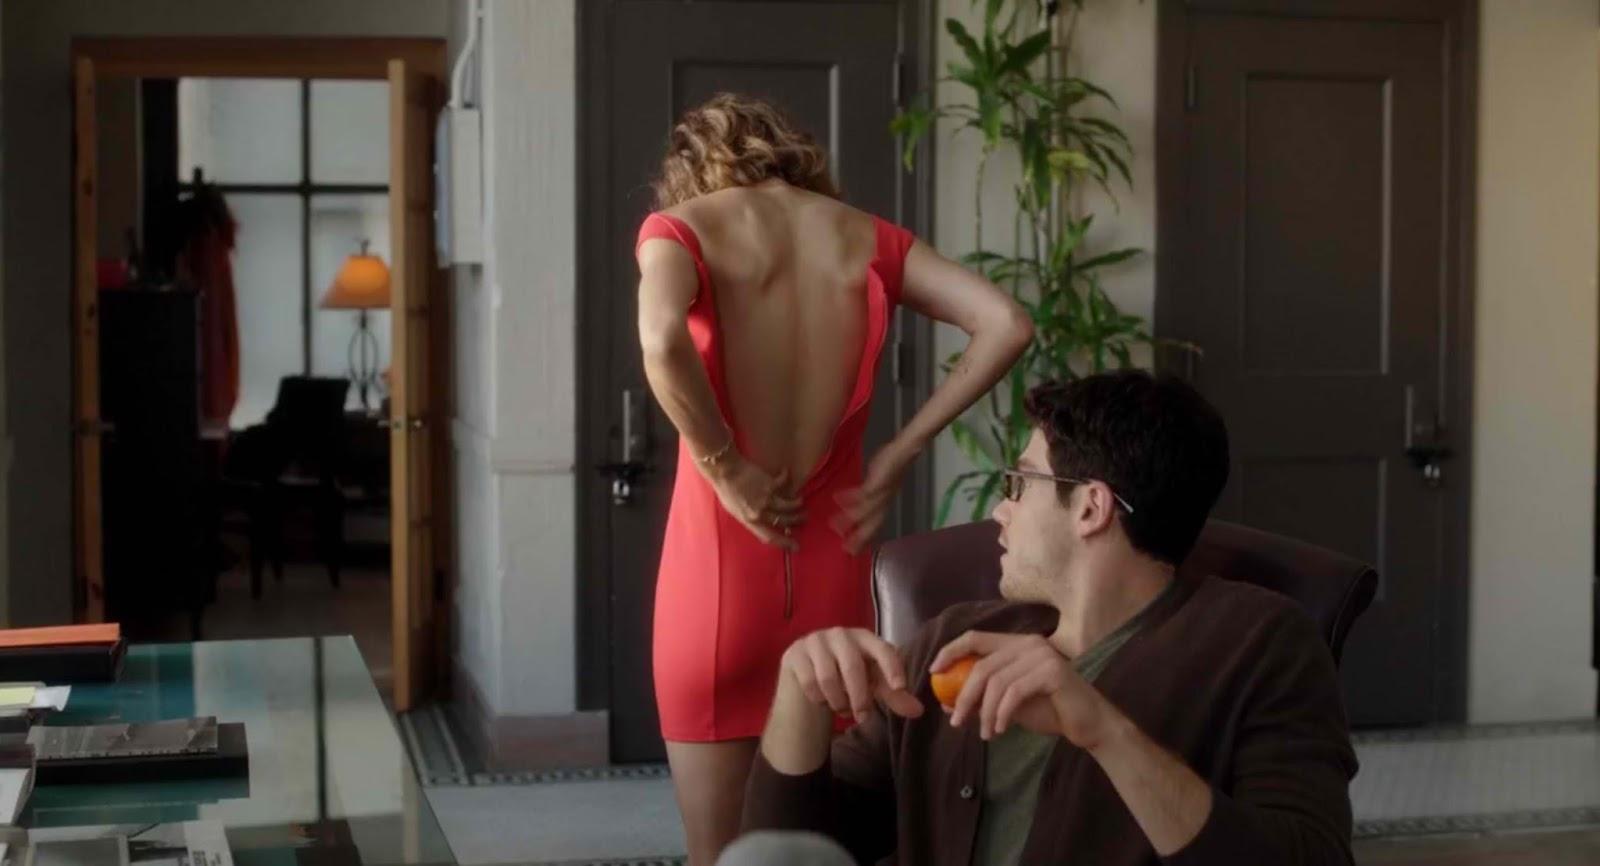 sensuele massage voor mannen werken als escort girl